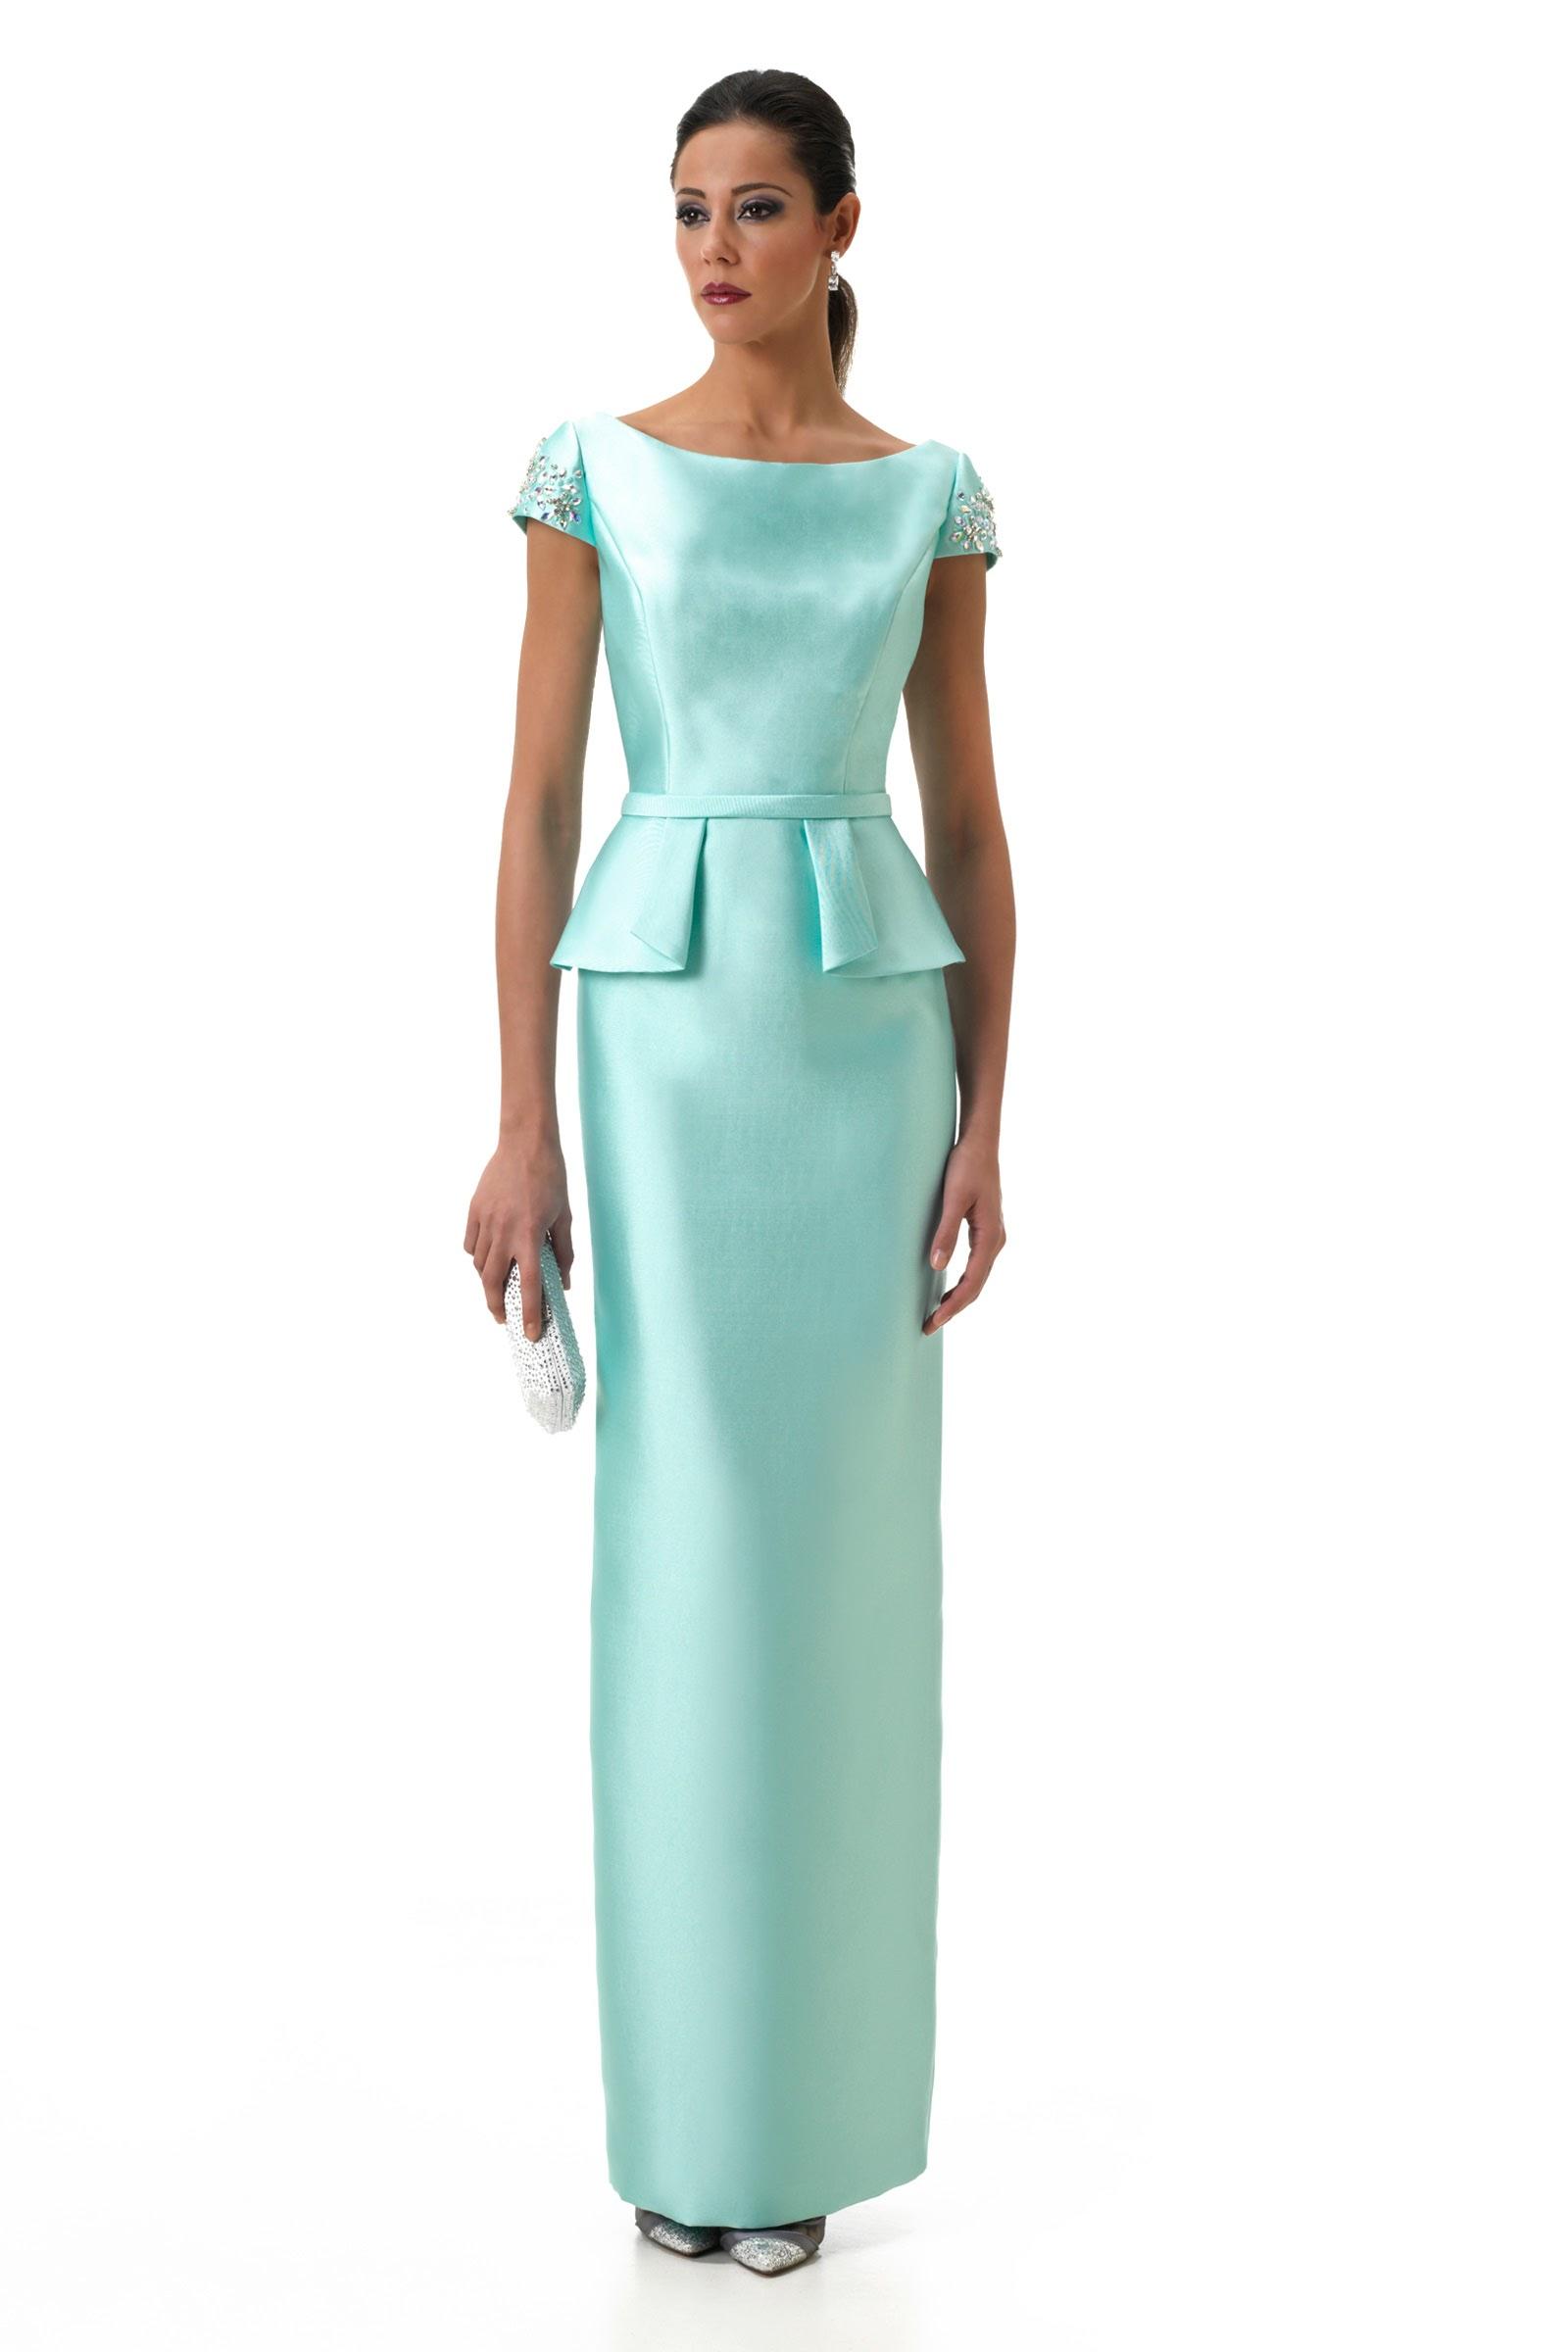 Vestido Carmen Cara 012 - penhalta